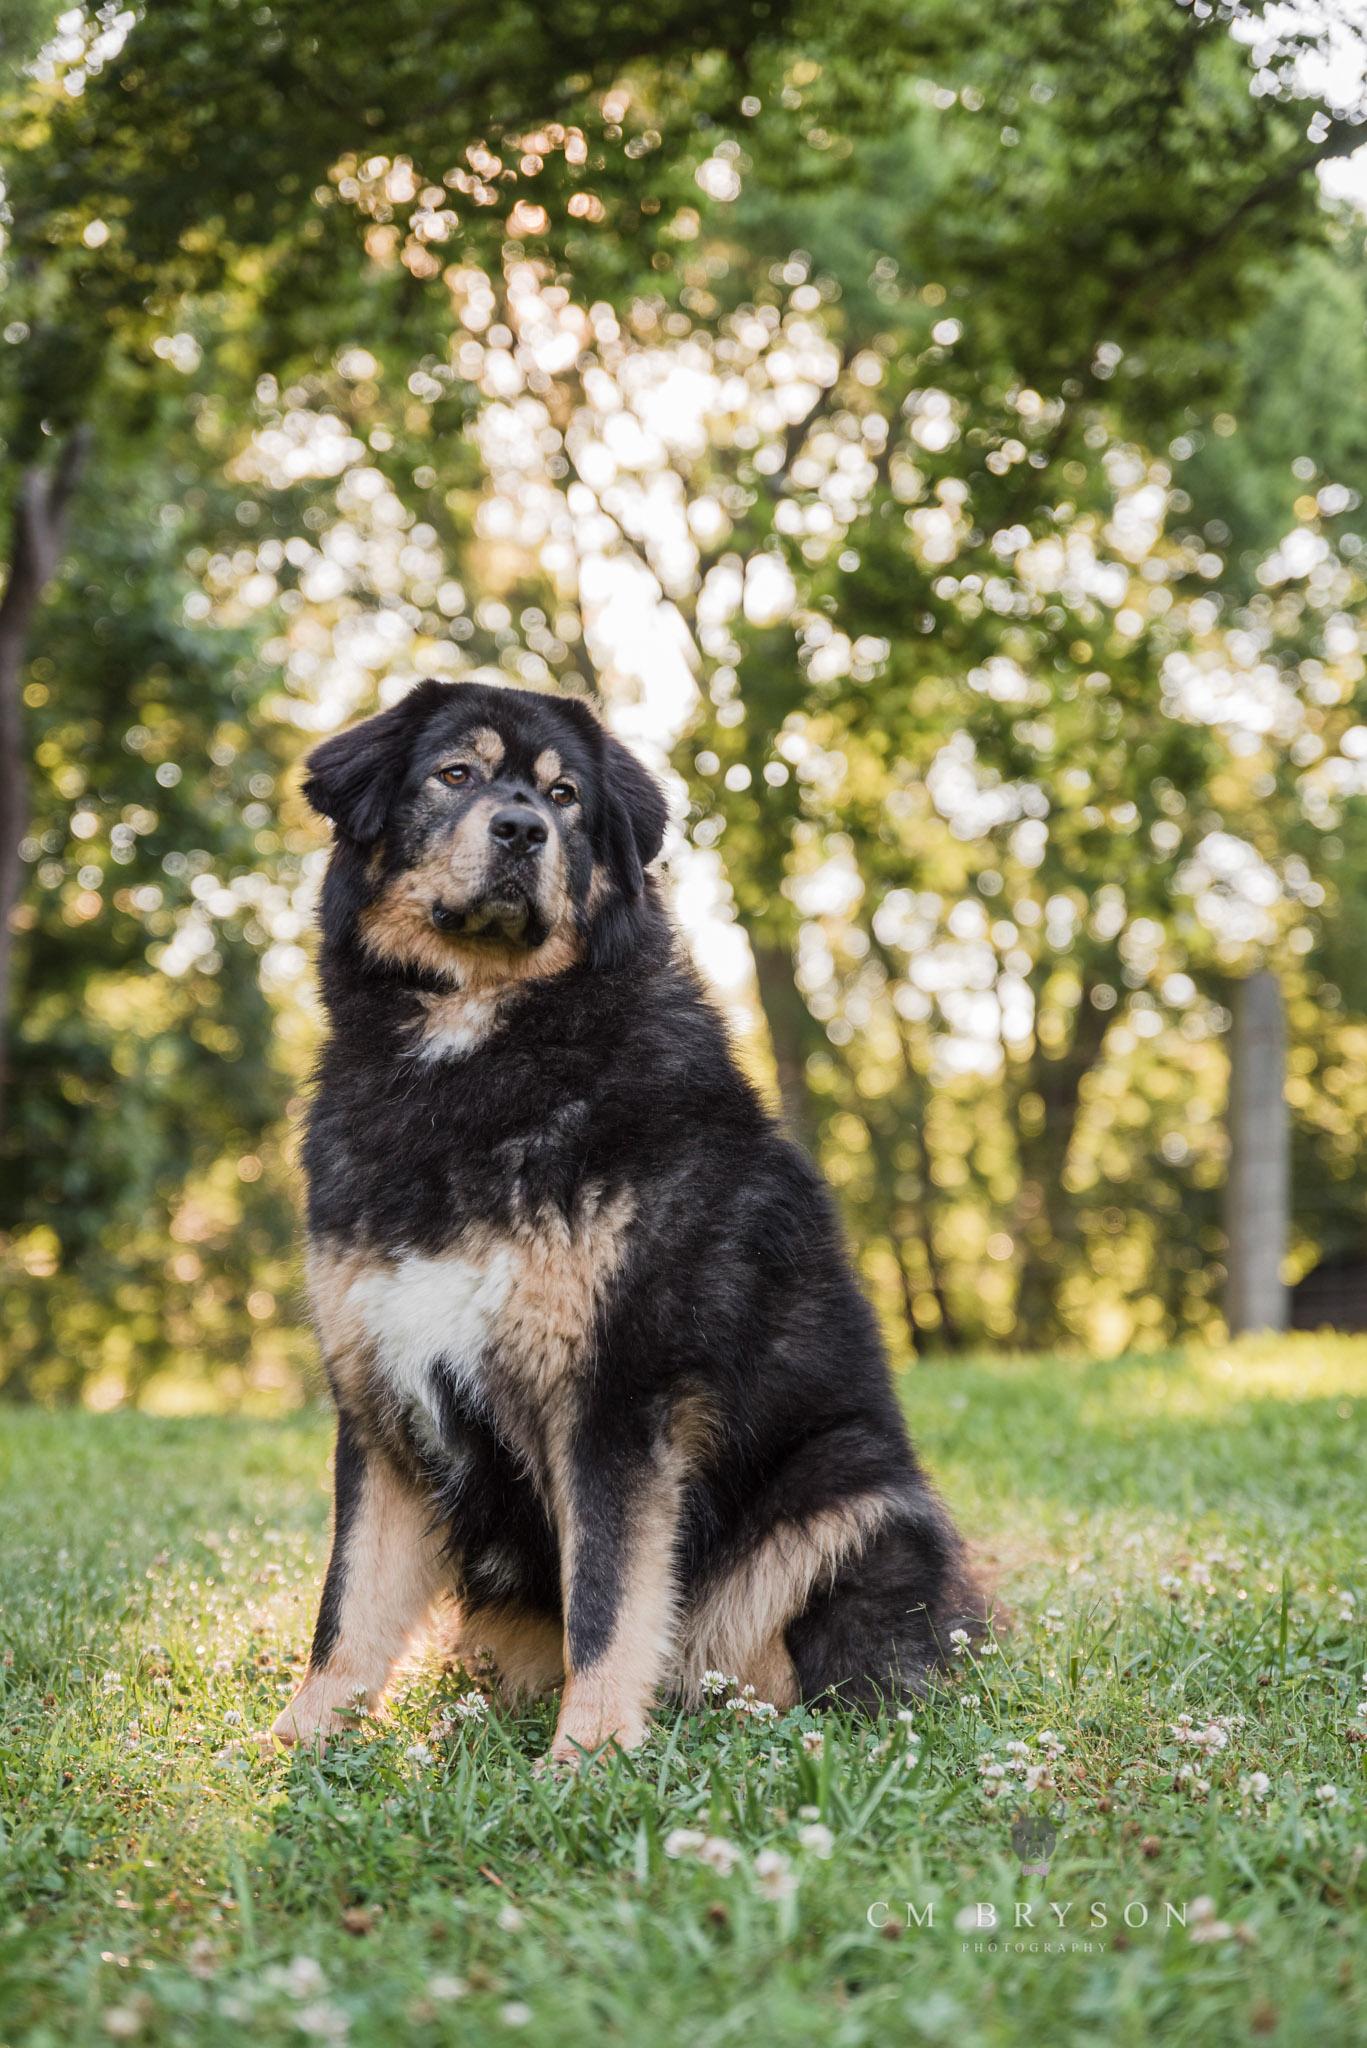 Atlanta pet photographer photographs dogs in a natural park setting at McDaniel Farm Park in Duluth, Georgia.